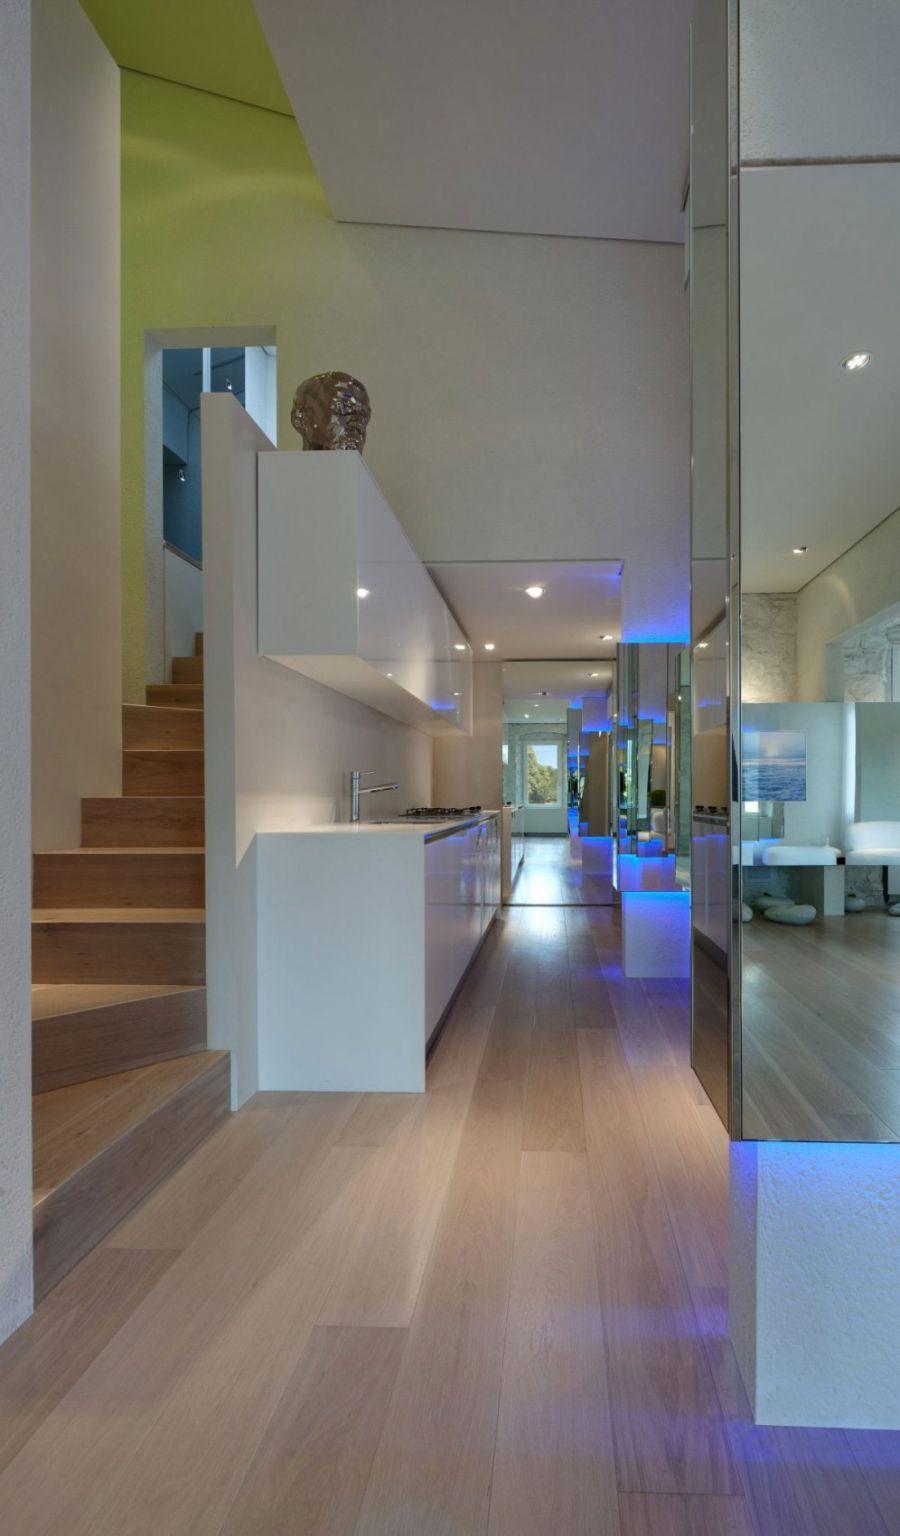 Narrow kitchen with ergonomic shelves